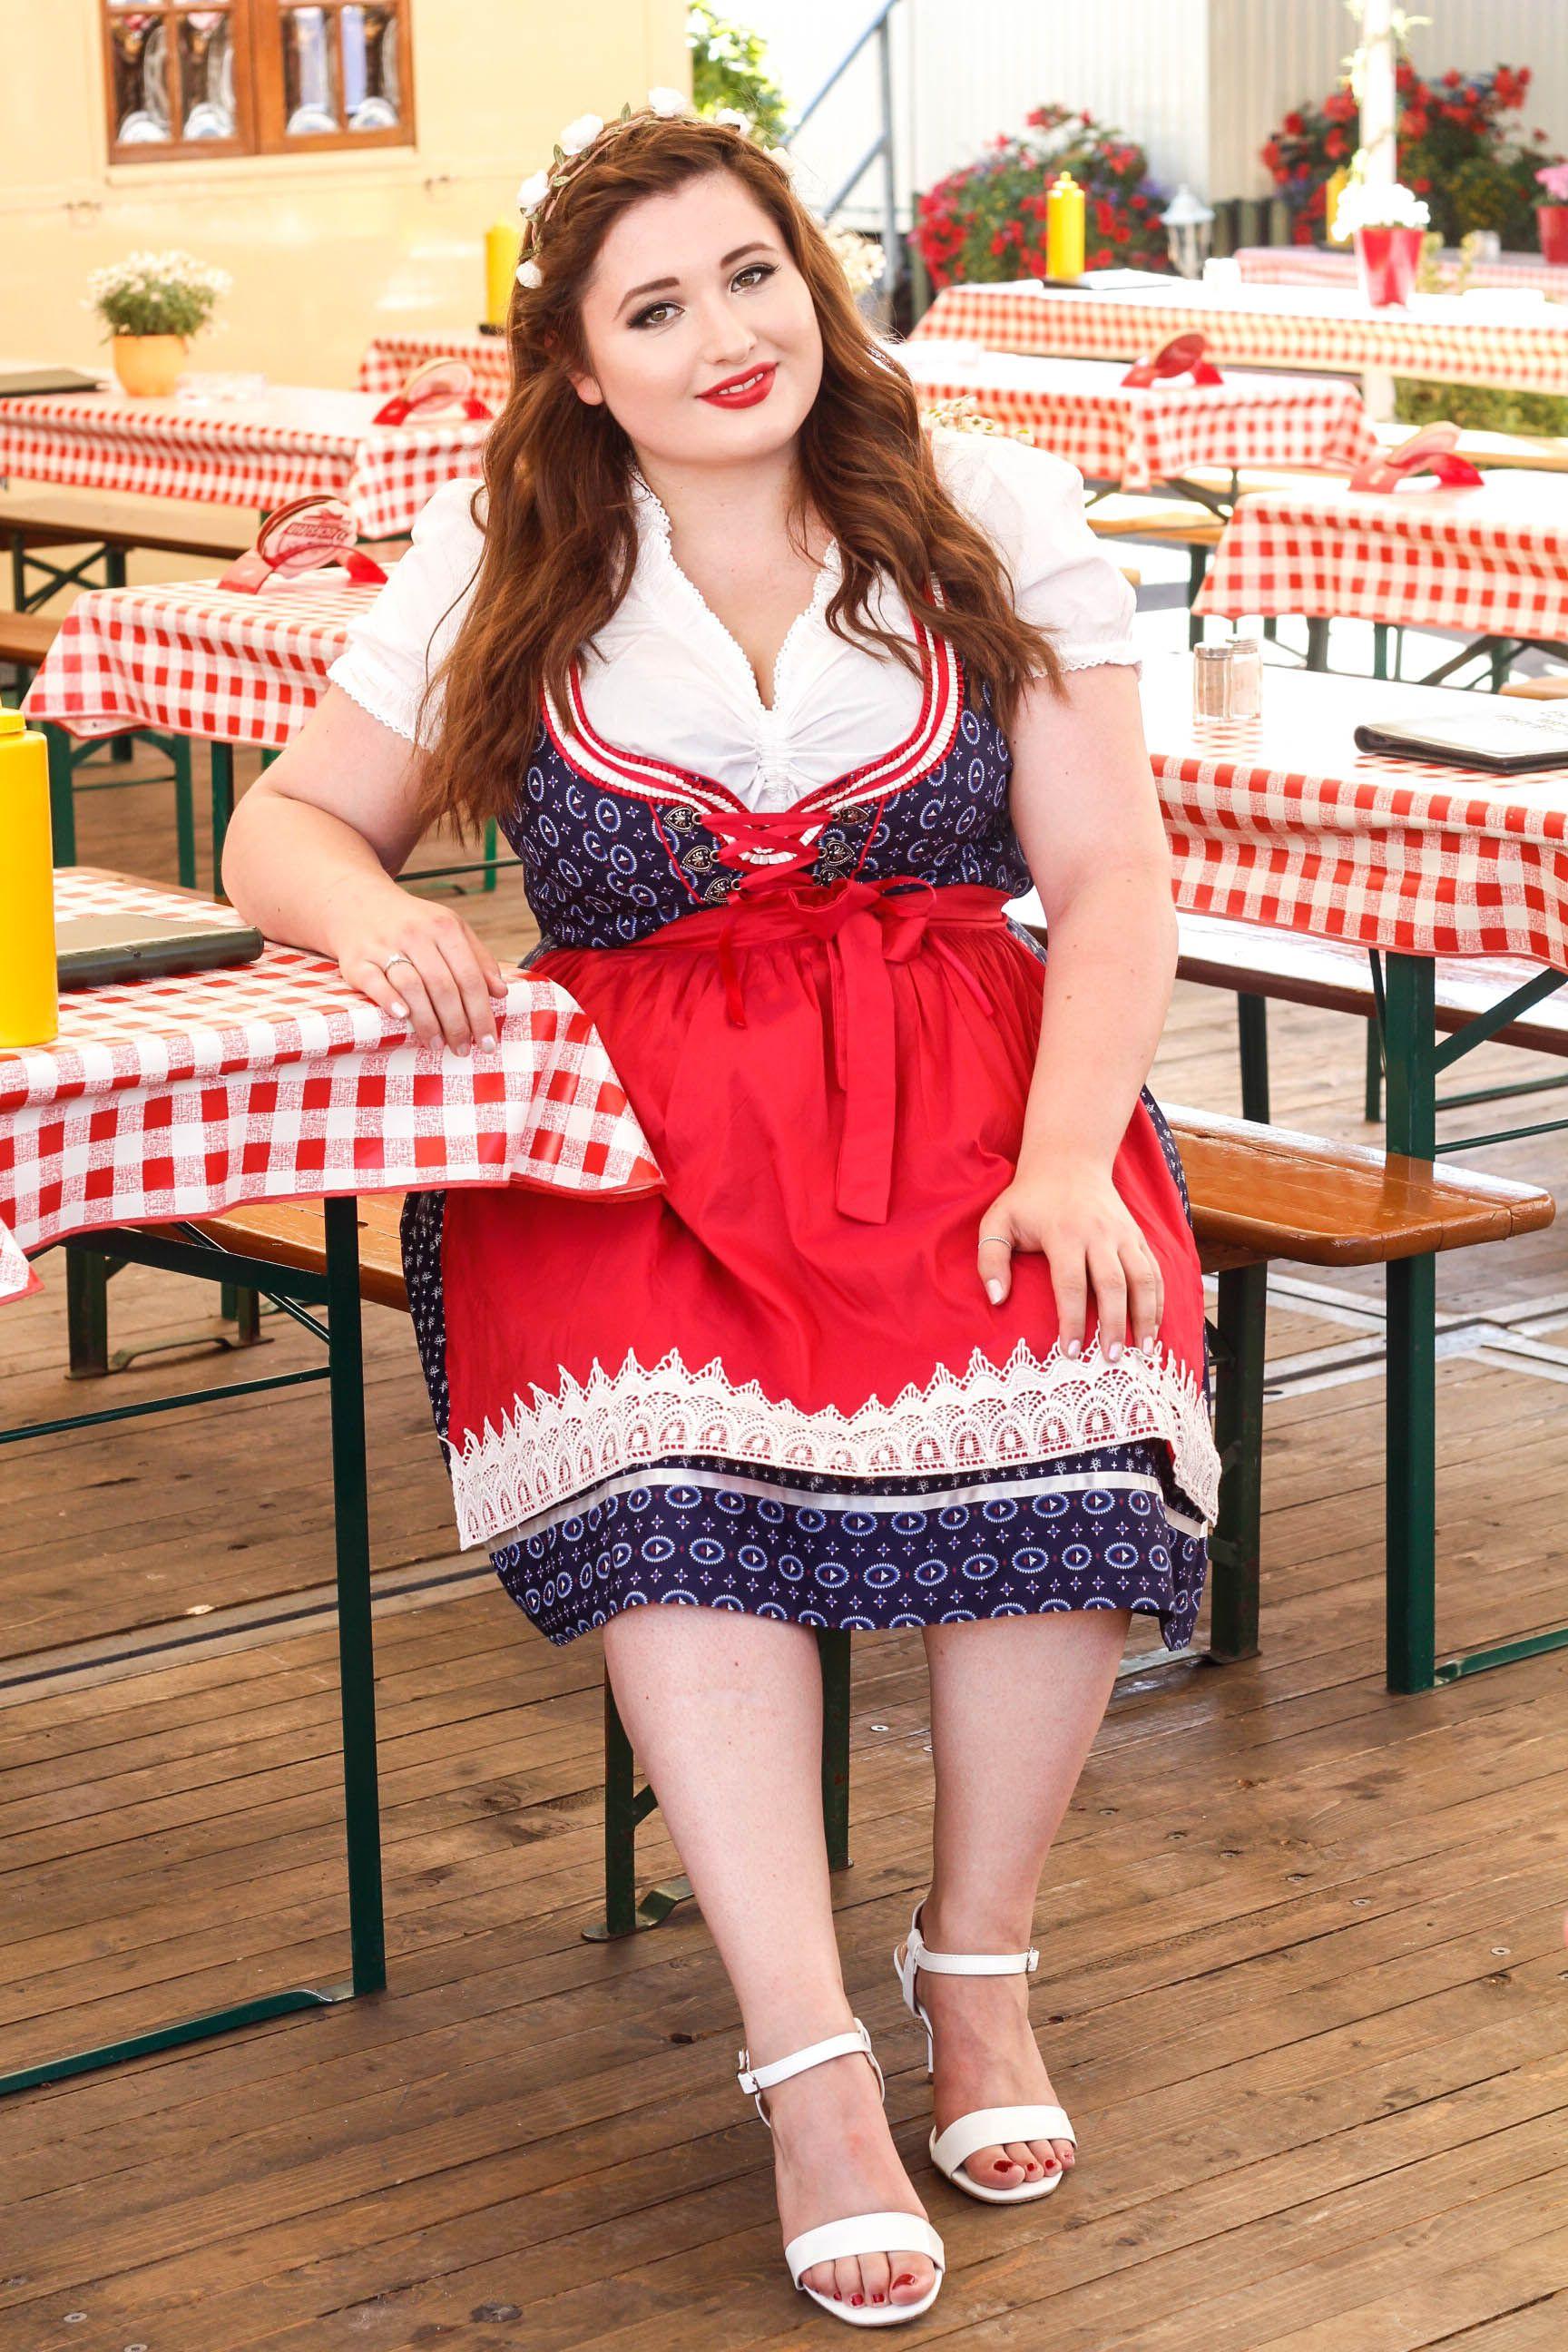 bc7a13273b4 Junge kurvige Frau im Oktoberfest Outfit. Plus Size Dirndl Look.